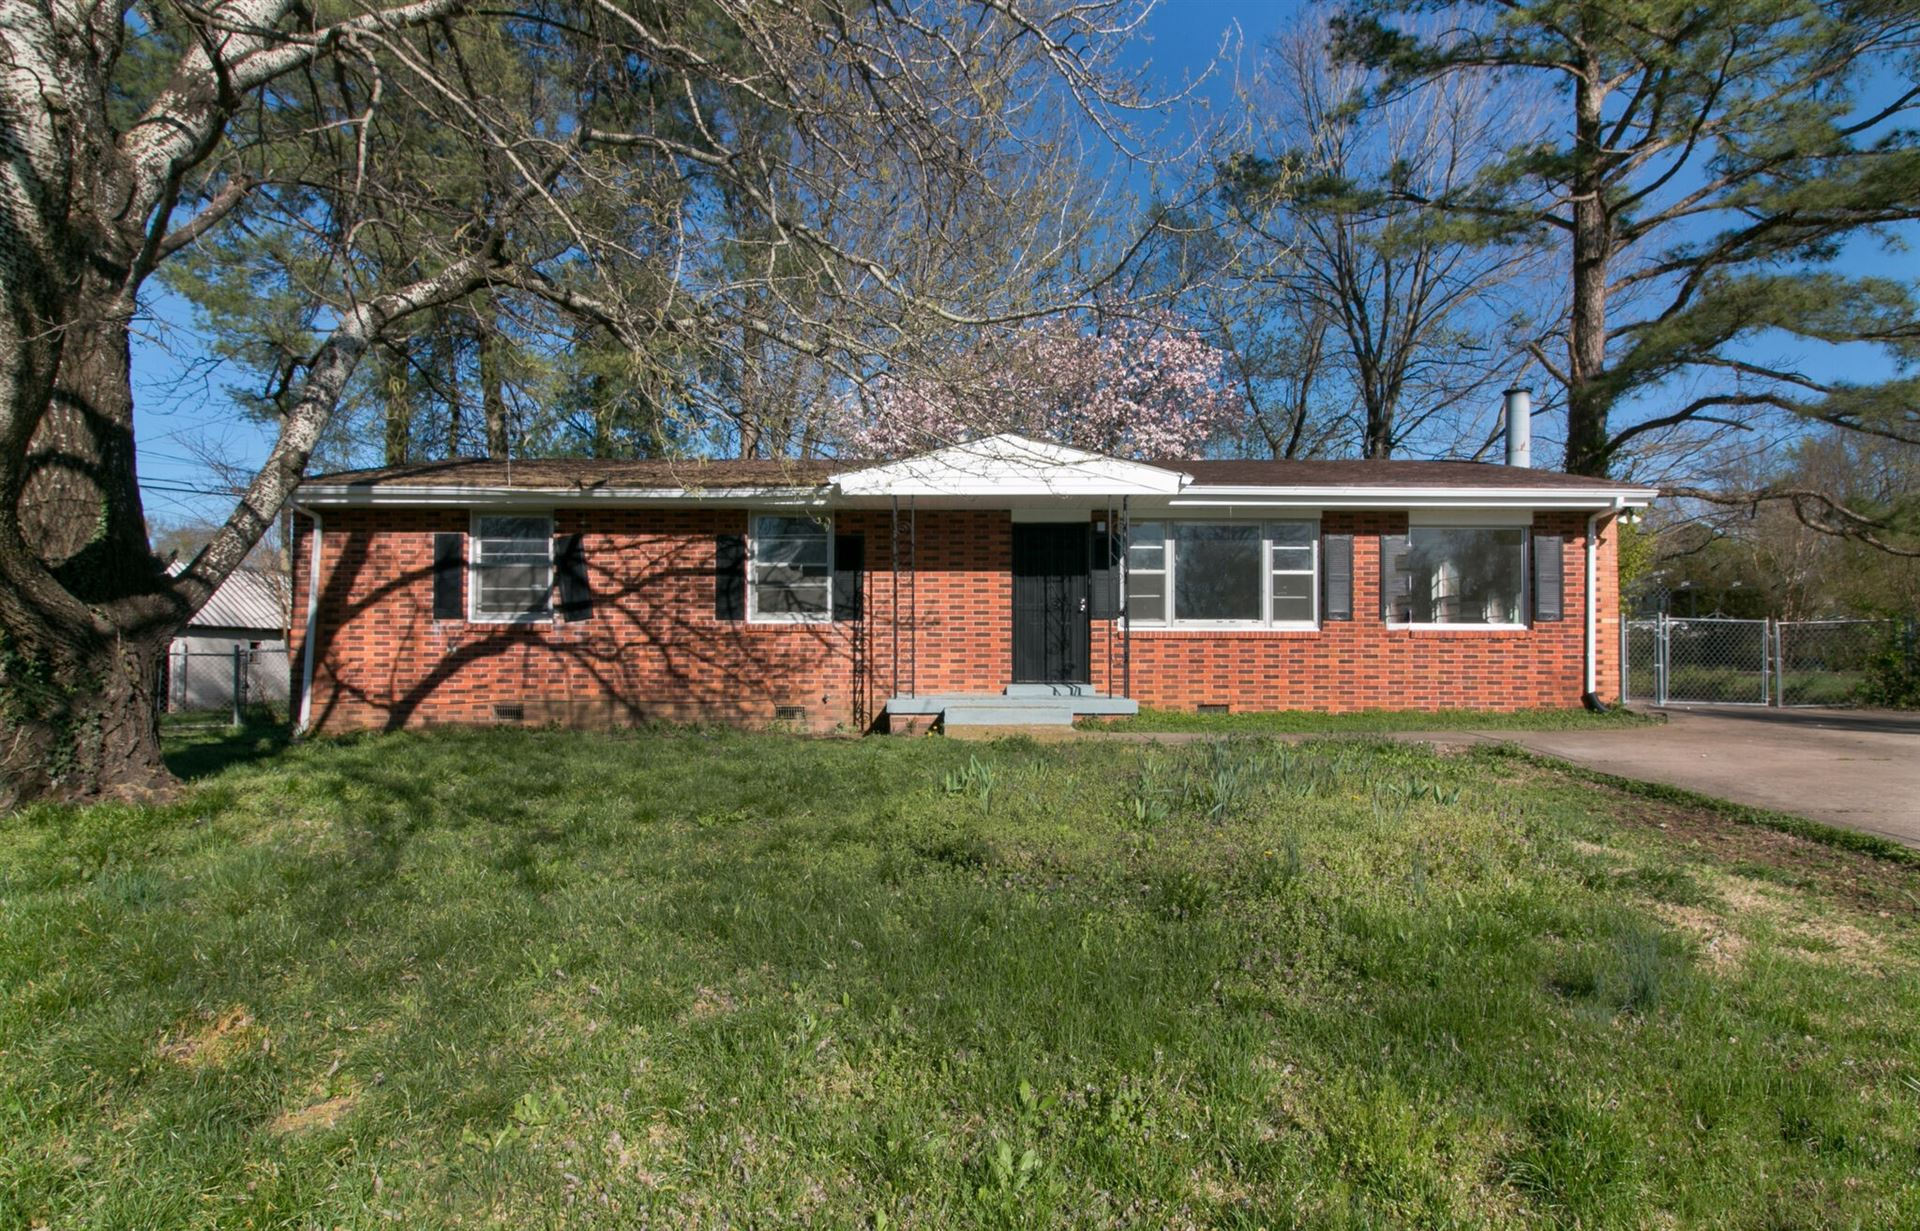 10 Jana Dr, Clarksville, TN 37042 - MLS#: 2239689